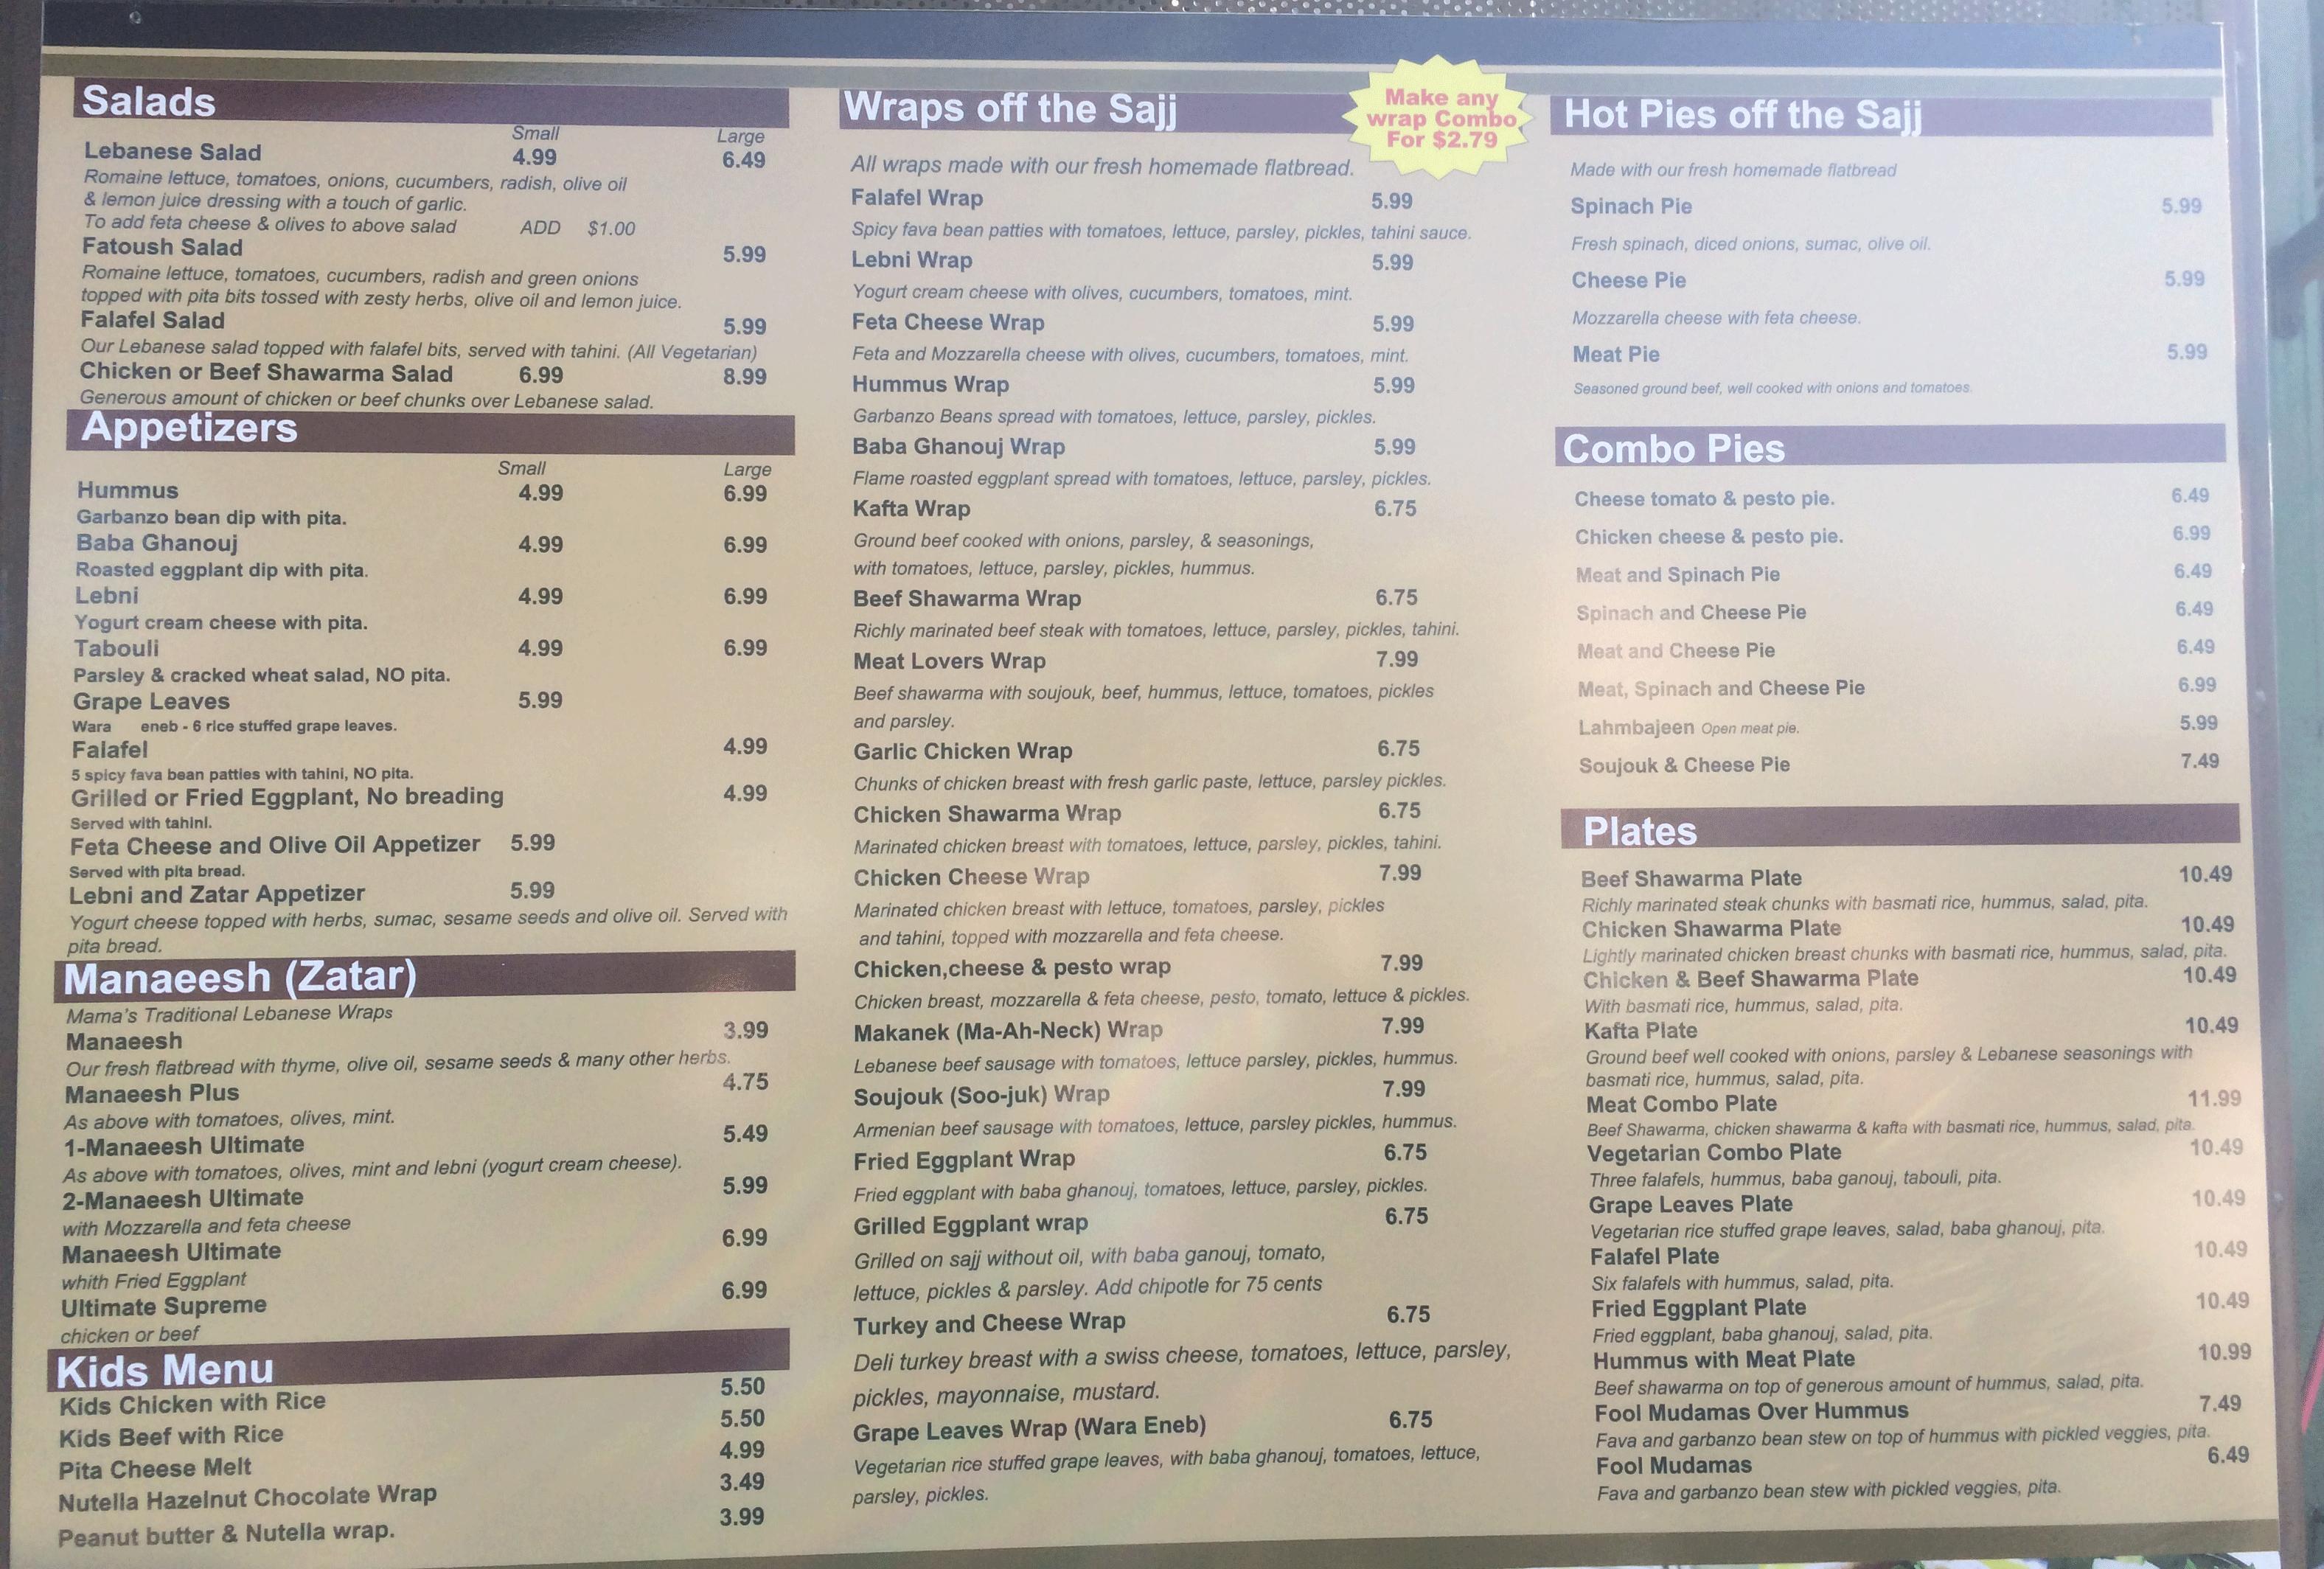 Mamas bakery north park menu evans menus outside menu altavistaventures Image collections